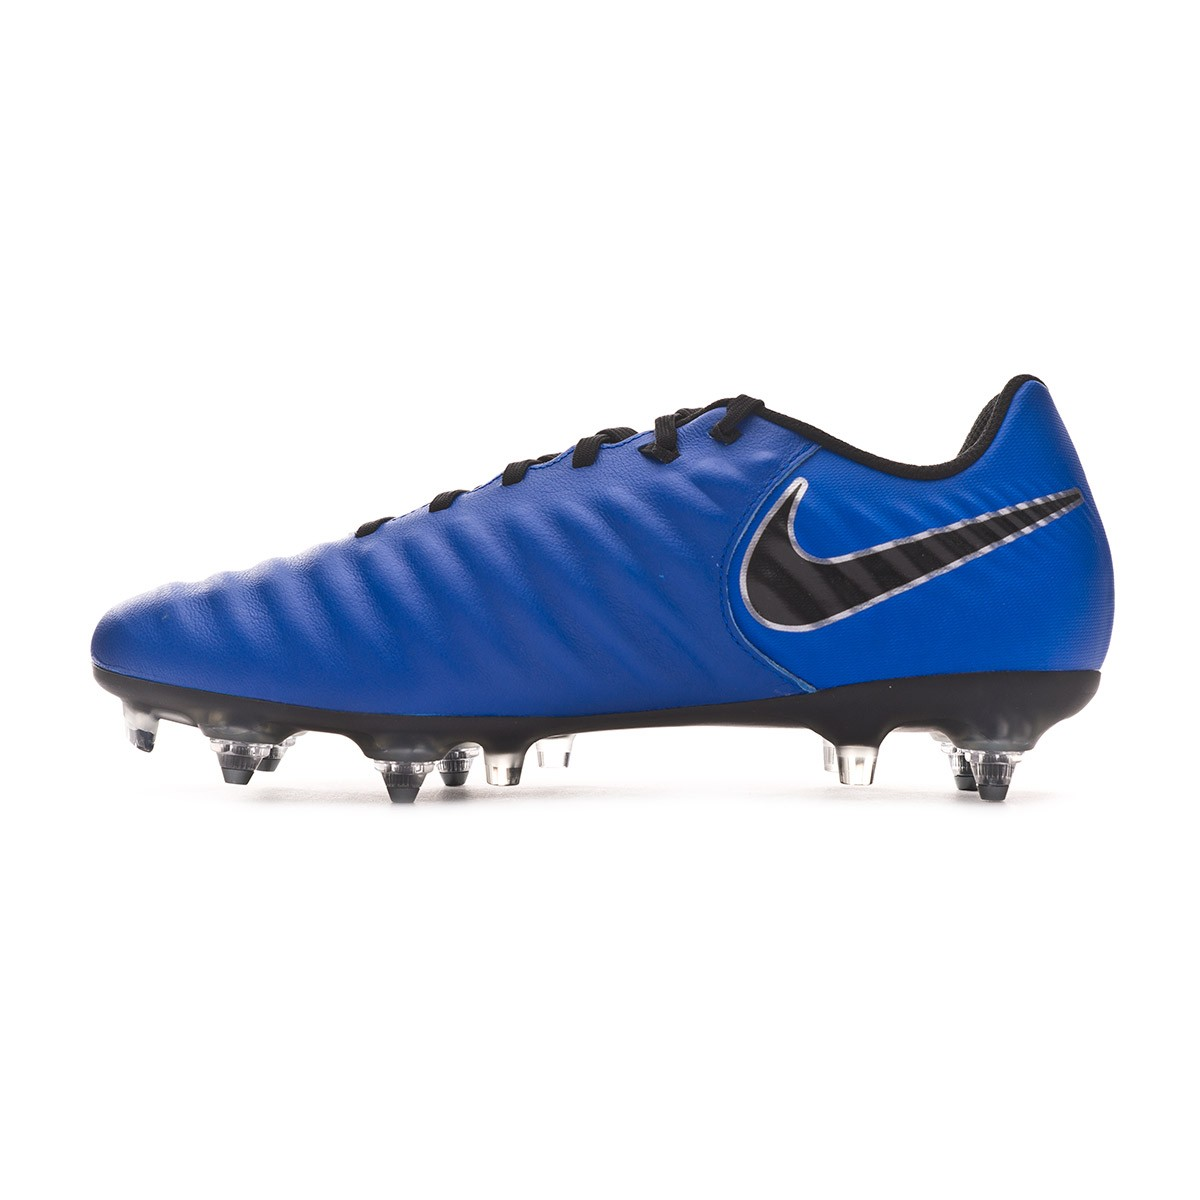 size 40 06e8a cfca3 Football Boots Nike Tiempo Legend VII Academy ACC SG-Pro Racer blue-Black-Metallic  silver - Tienda de fútbol Fútbol Emotion